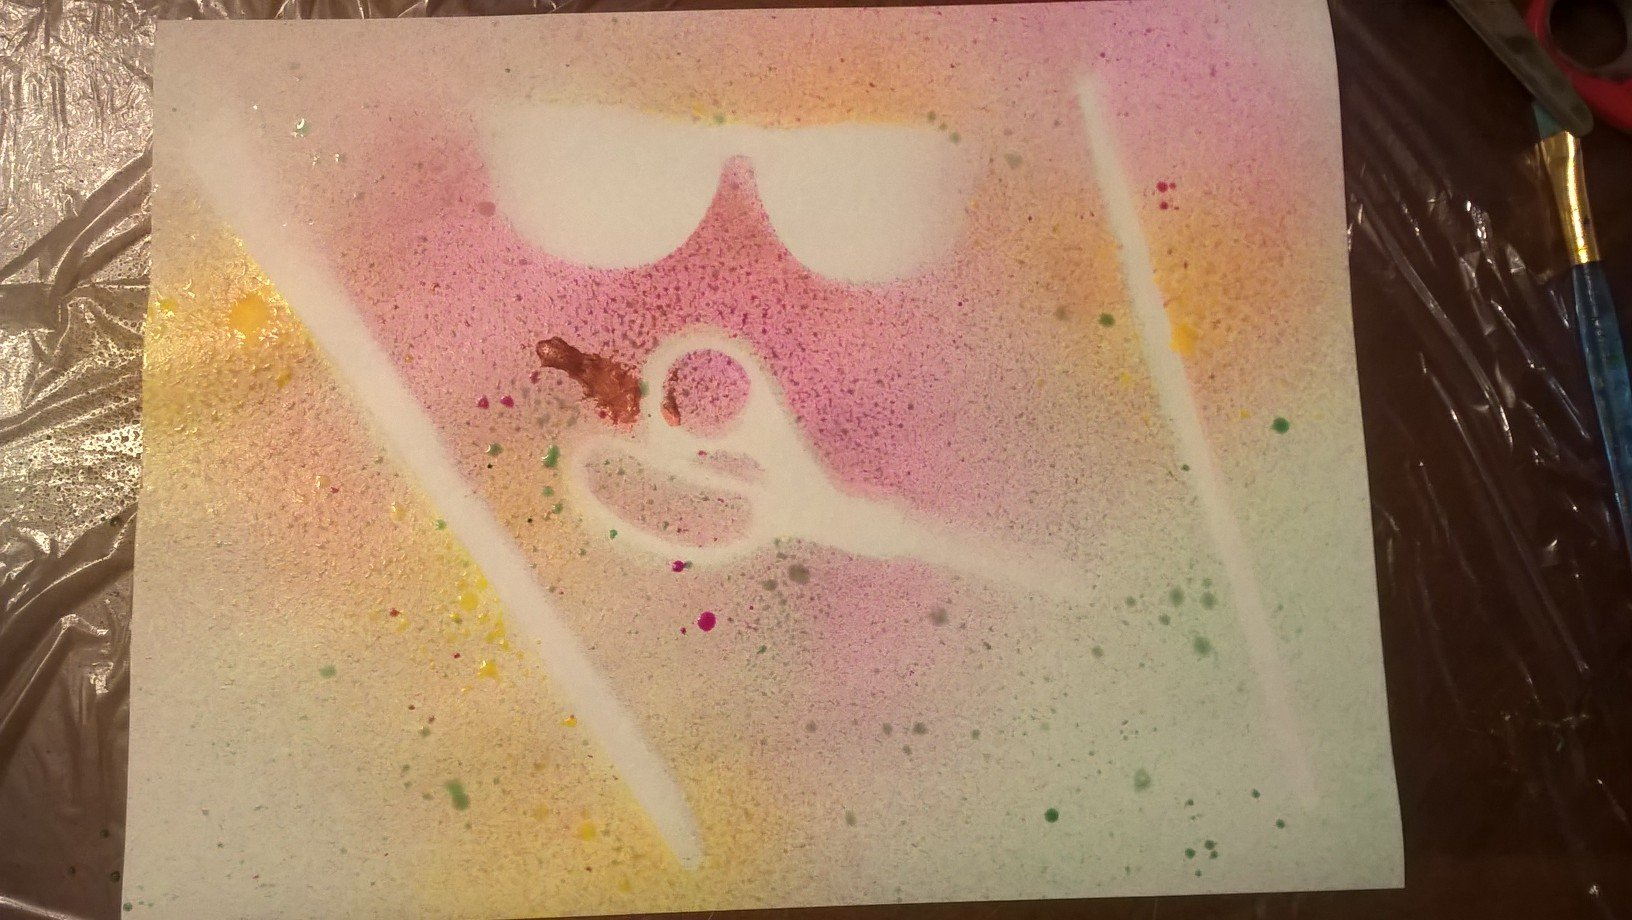 spray over scissor, glasses and paintbrush